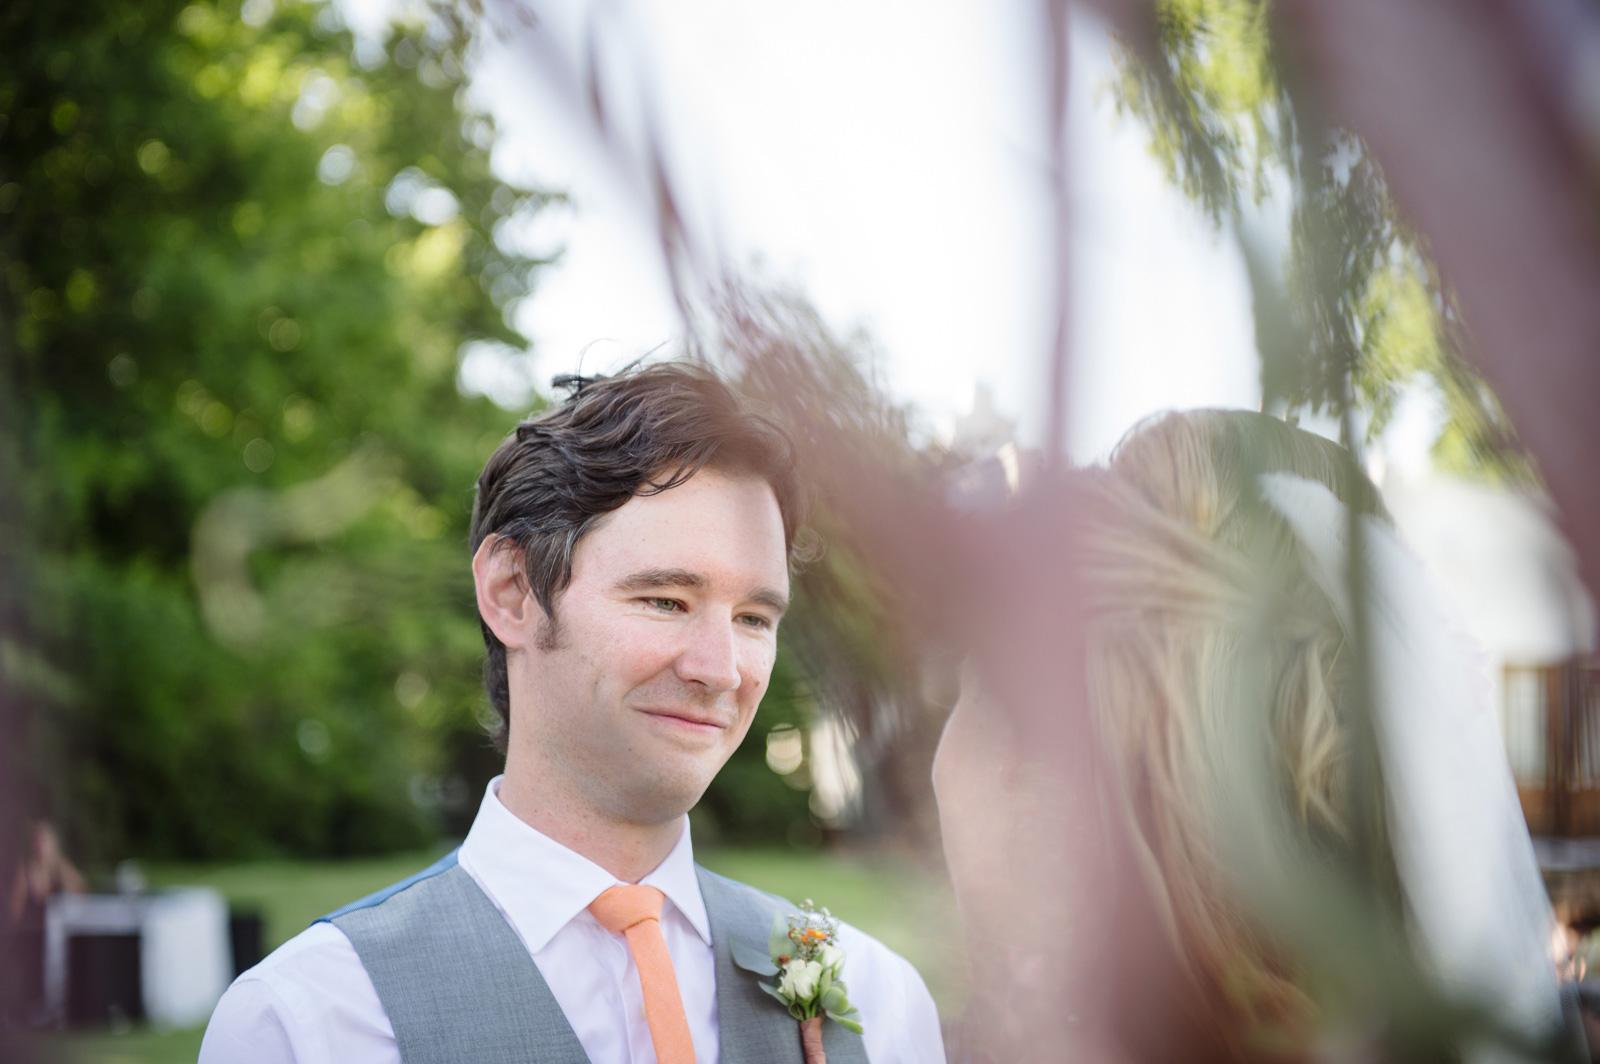 Vrede en Lust Cape Wedding Documentary Wedding Photography Ceremony Groom